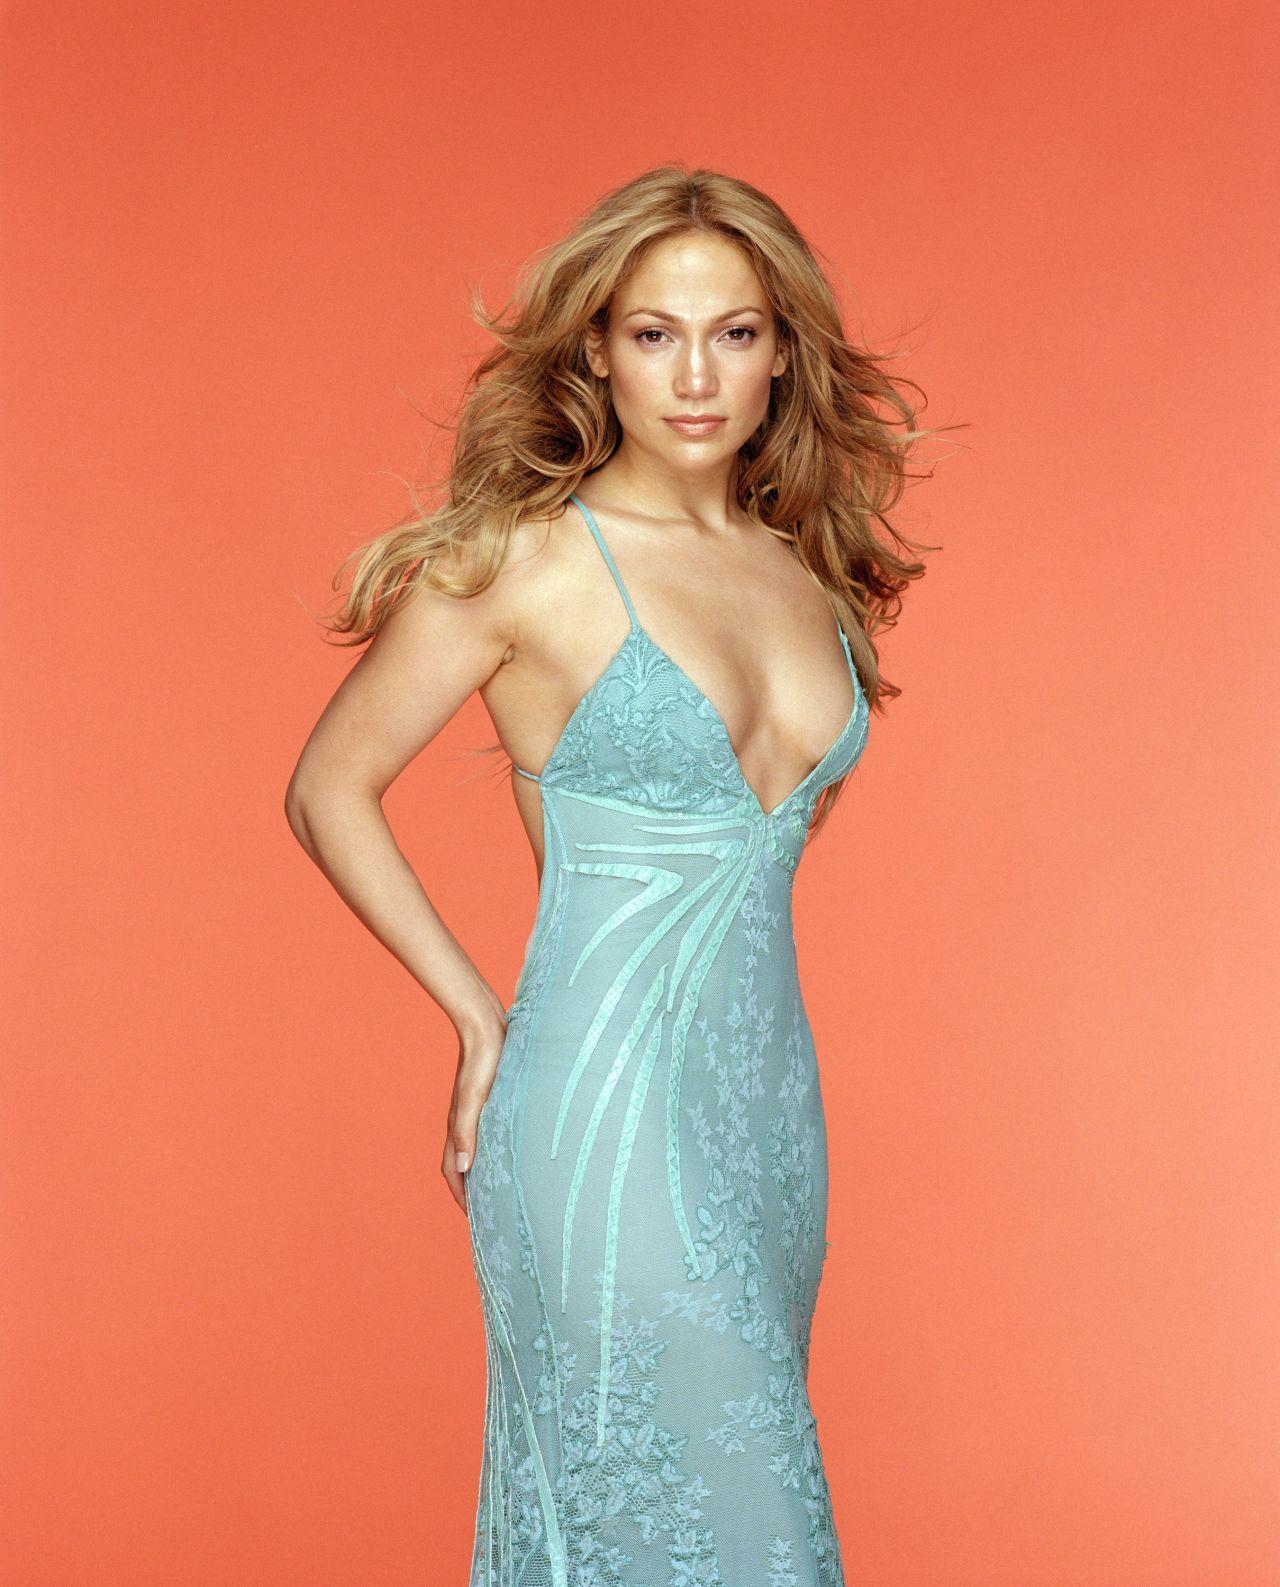 Jennifer Lopez 2000 Photoshoot